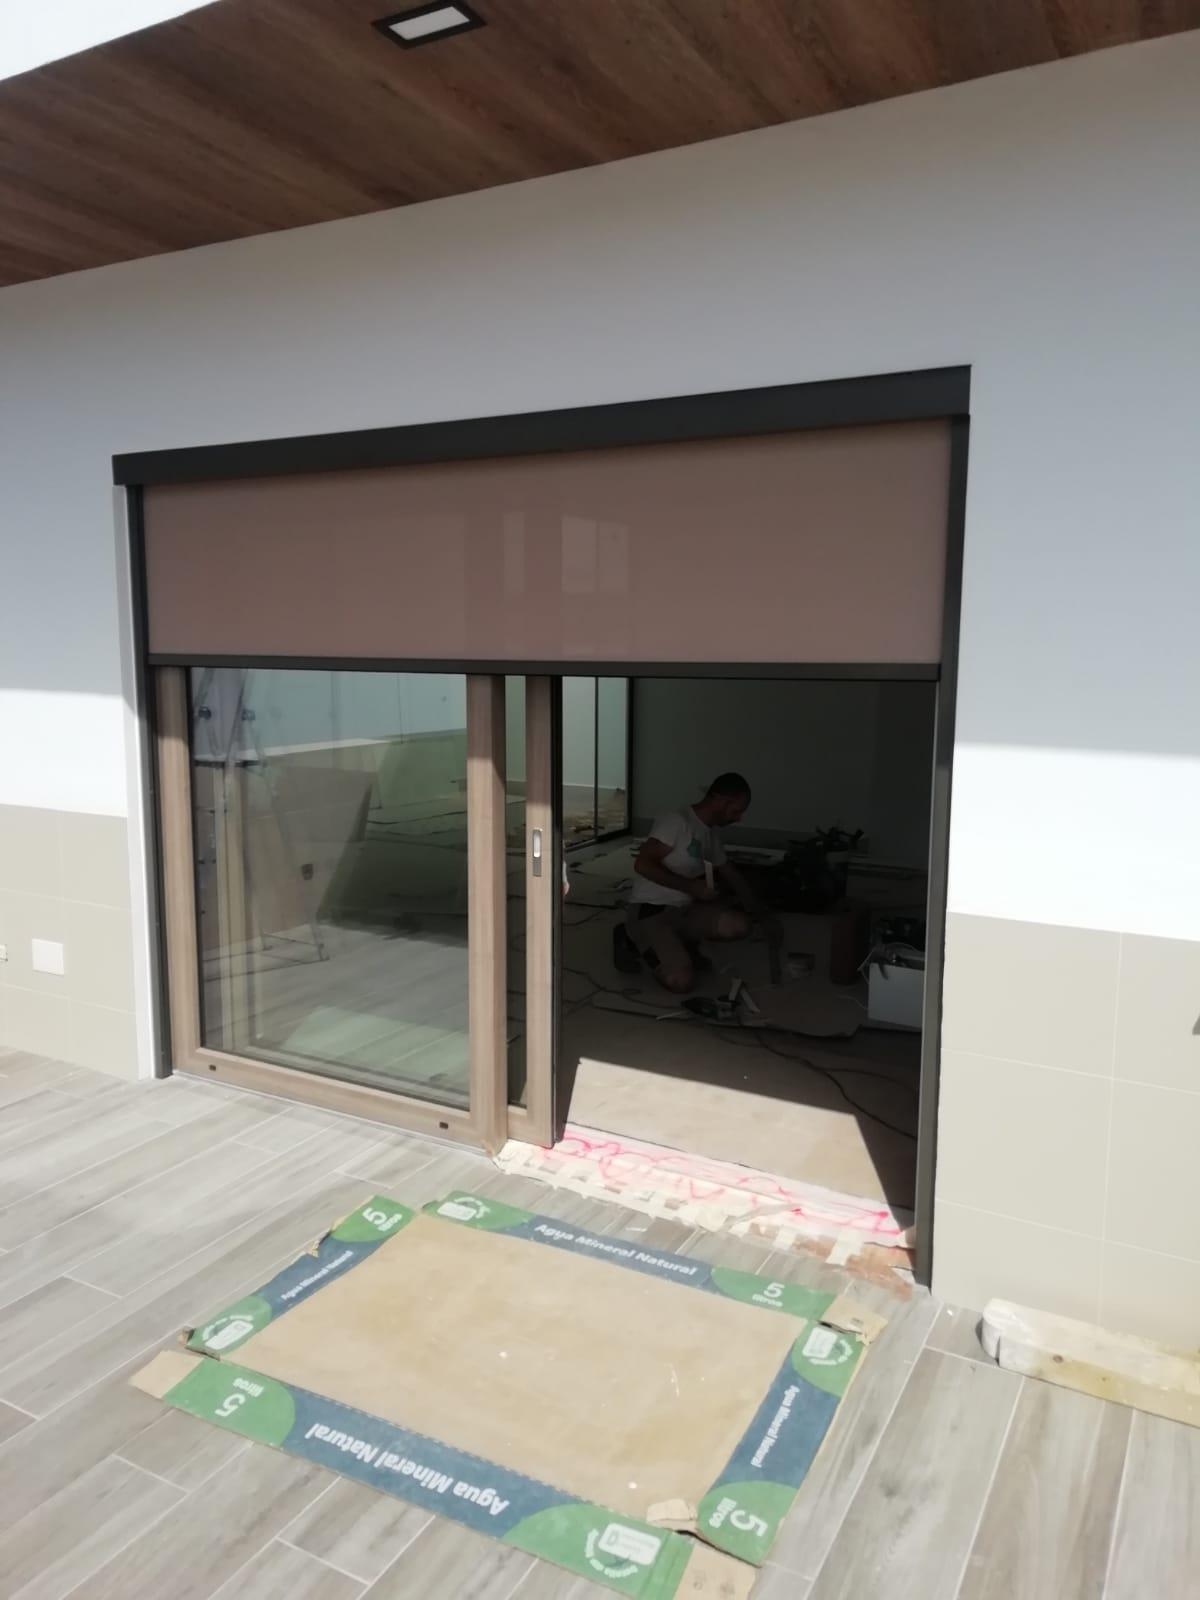 Solución ventana de PVC elevable con oscurecimiento con Windscreen